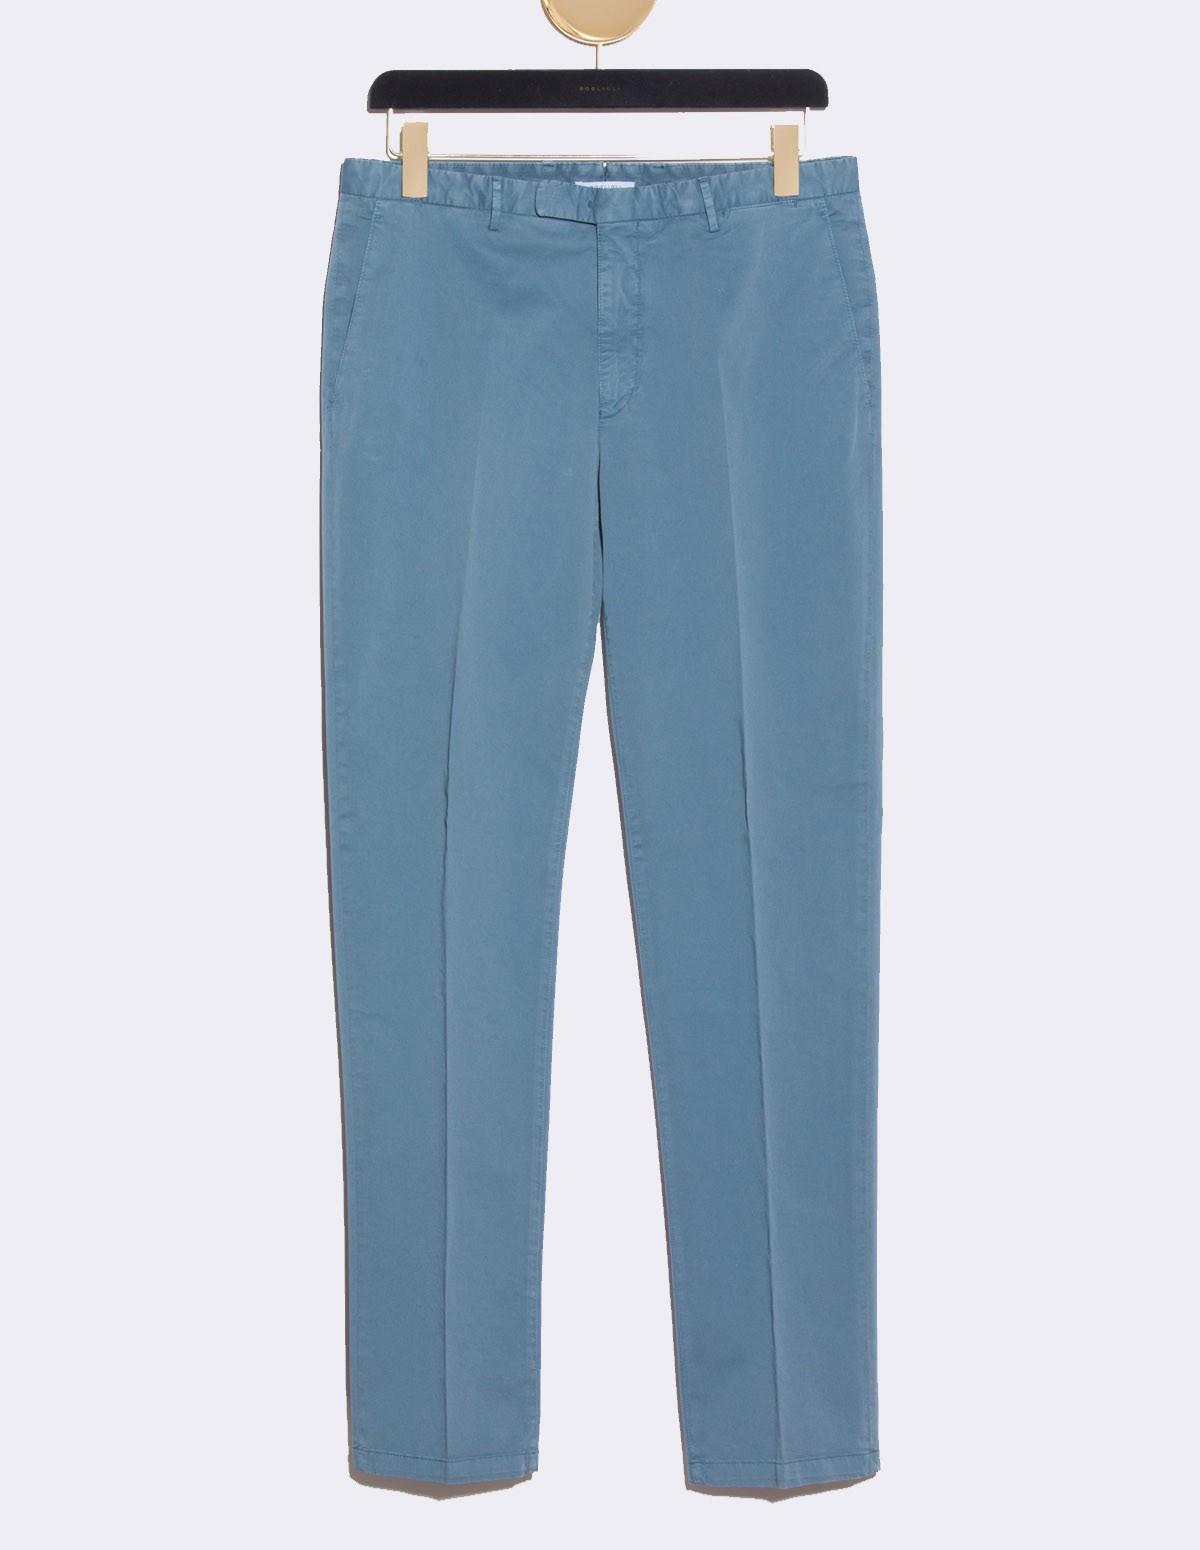 Boglioli Cotton Twill Pants